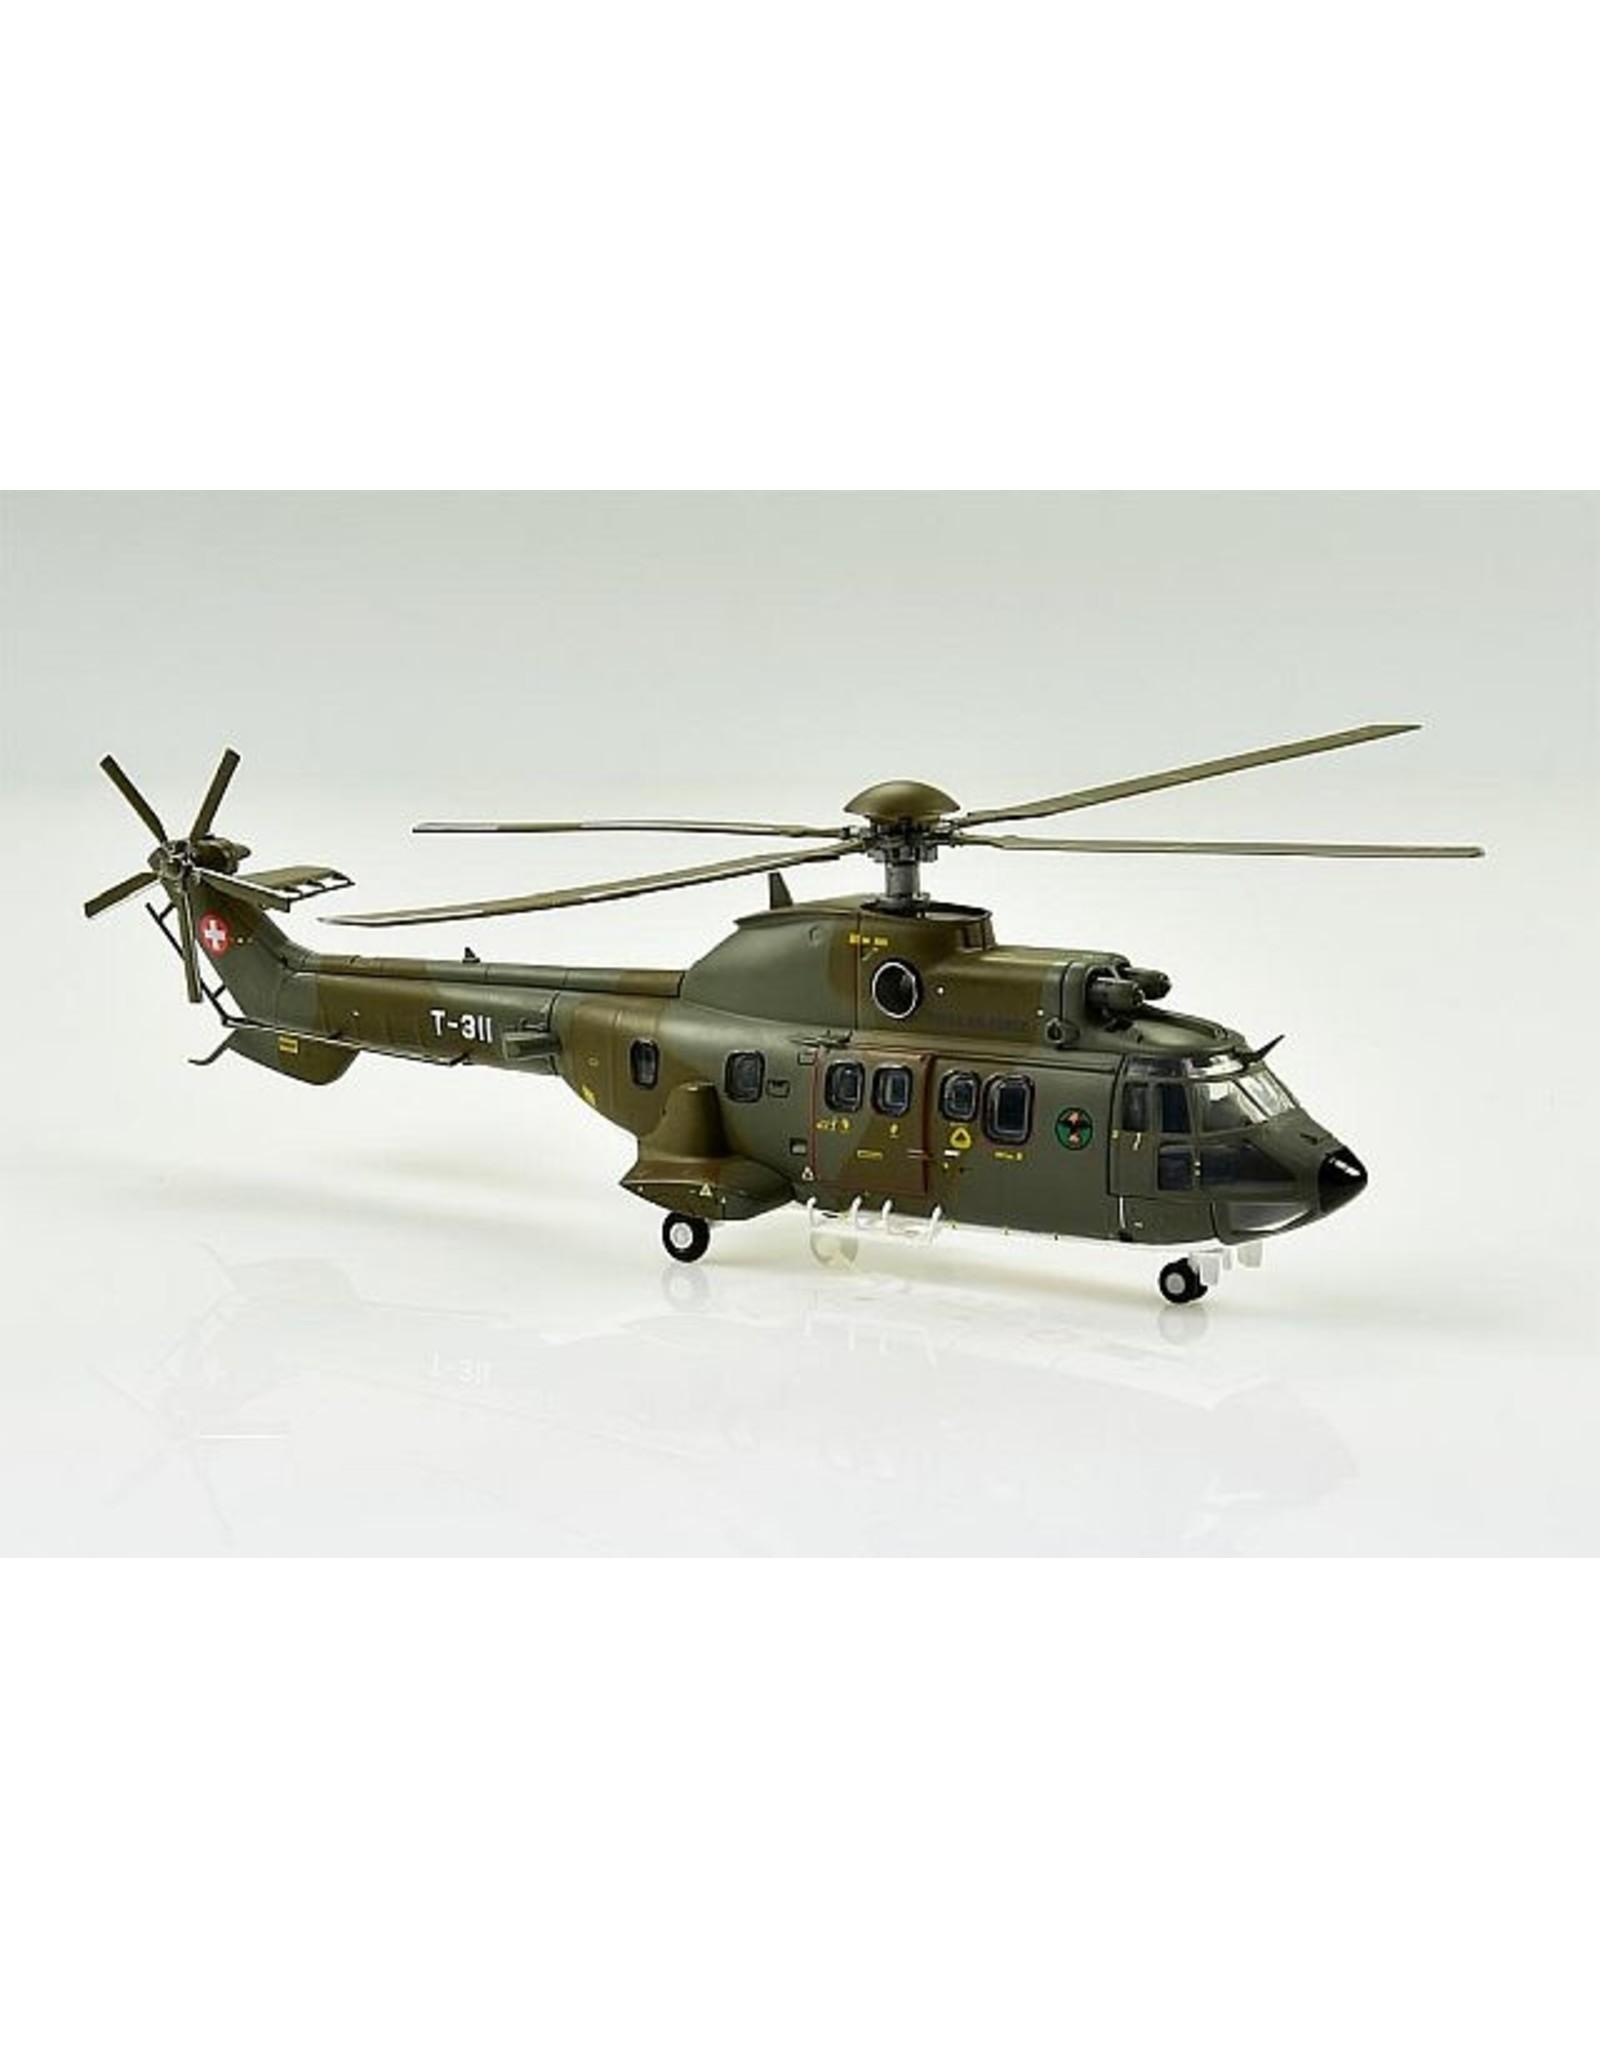 Eurocopter COUGAR AS532 STAFFEL 1 LA UNE T-311